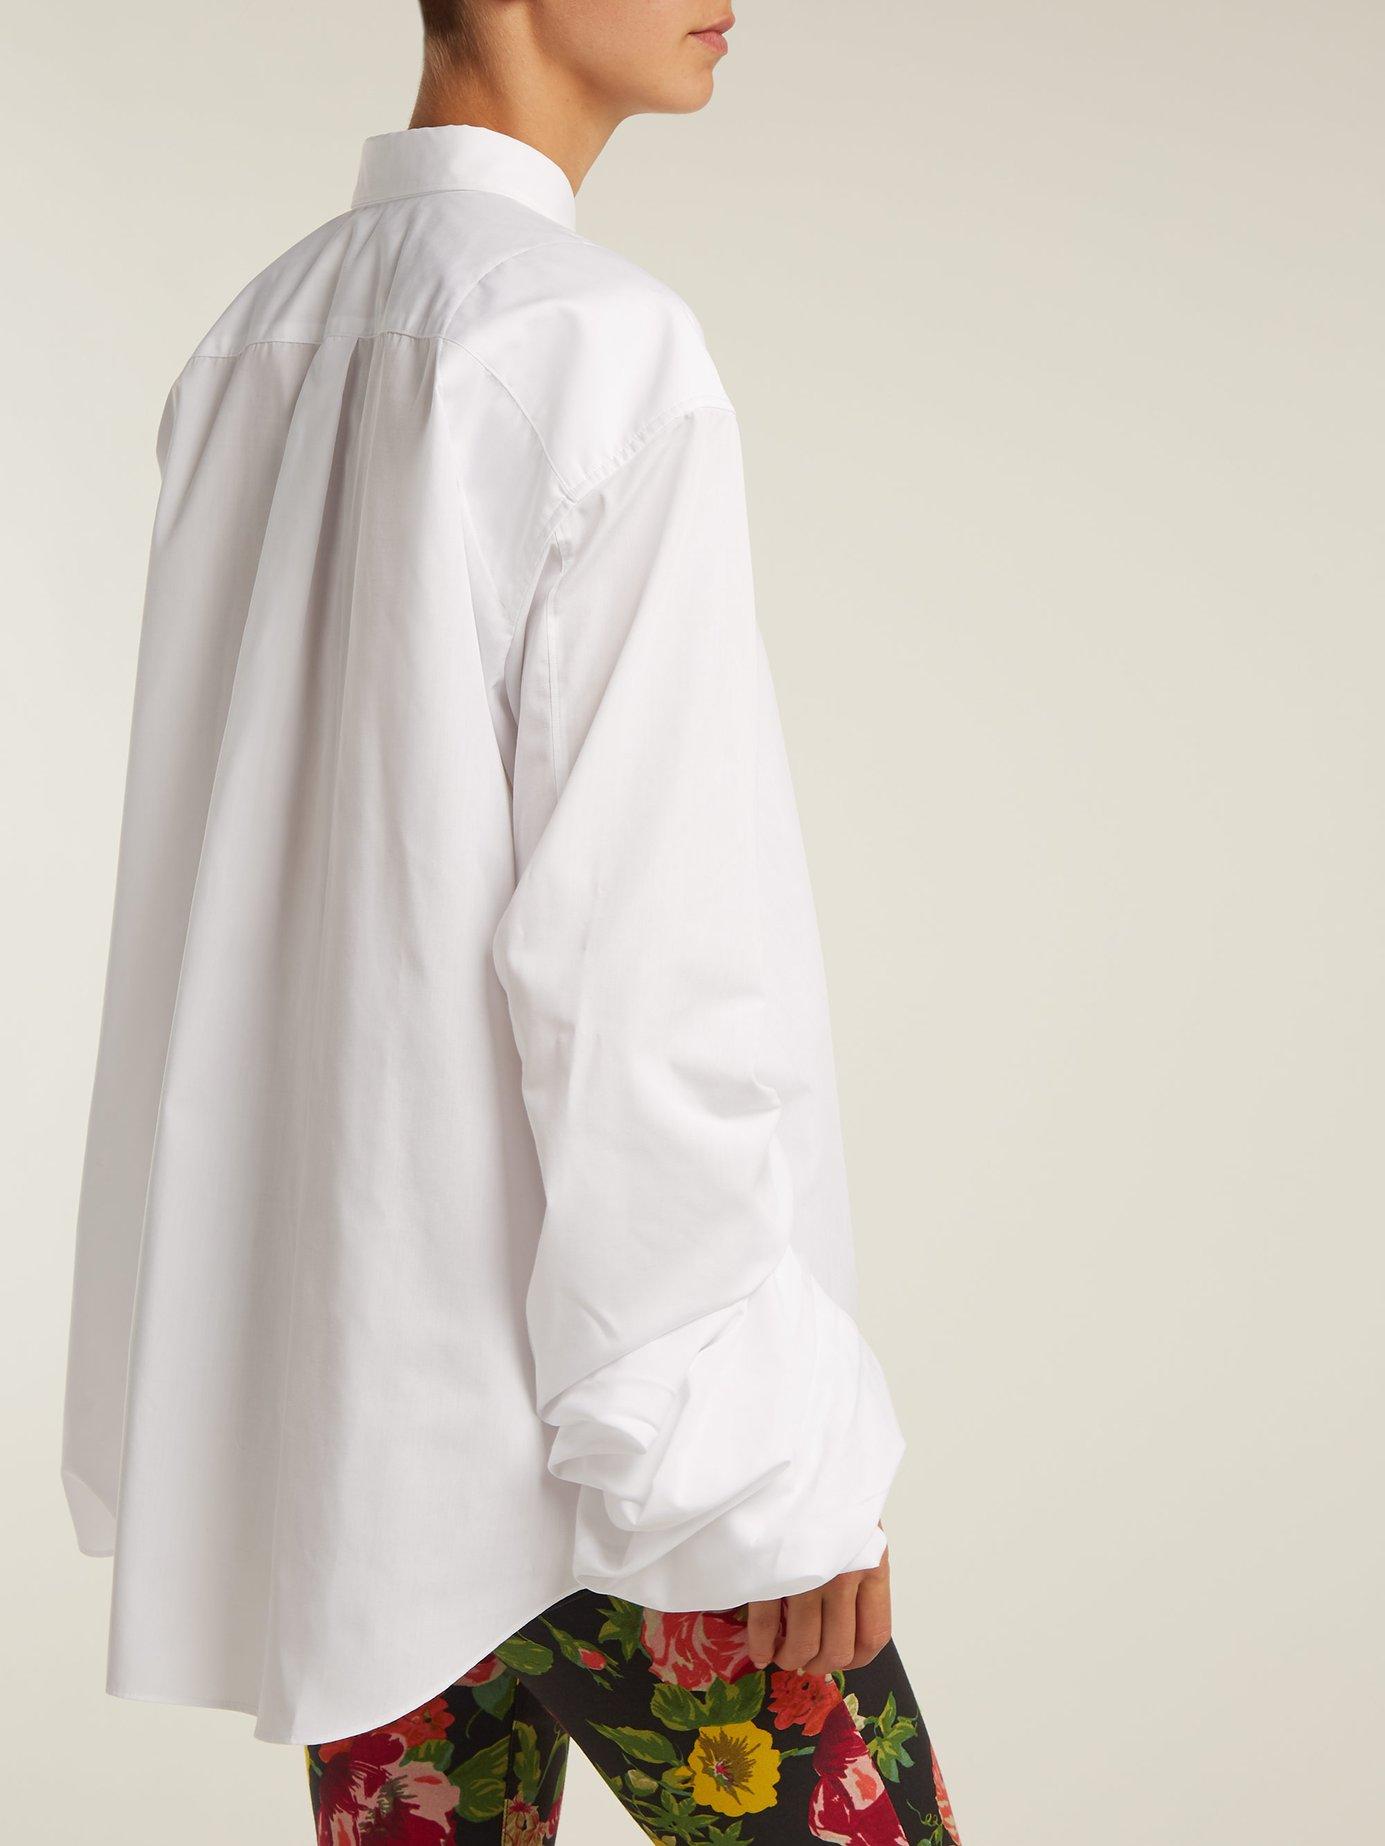 Ruched-sleeve poplin shirt by Junya Watanabe